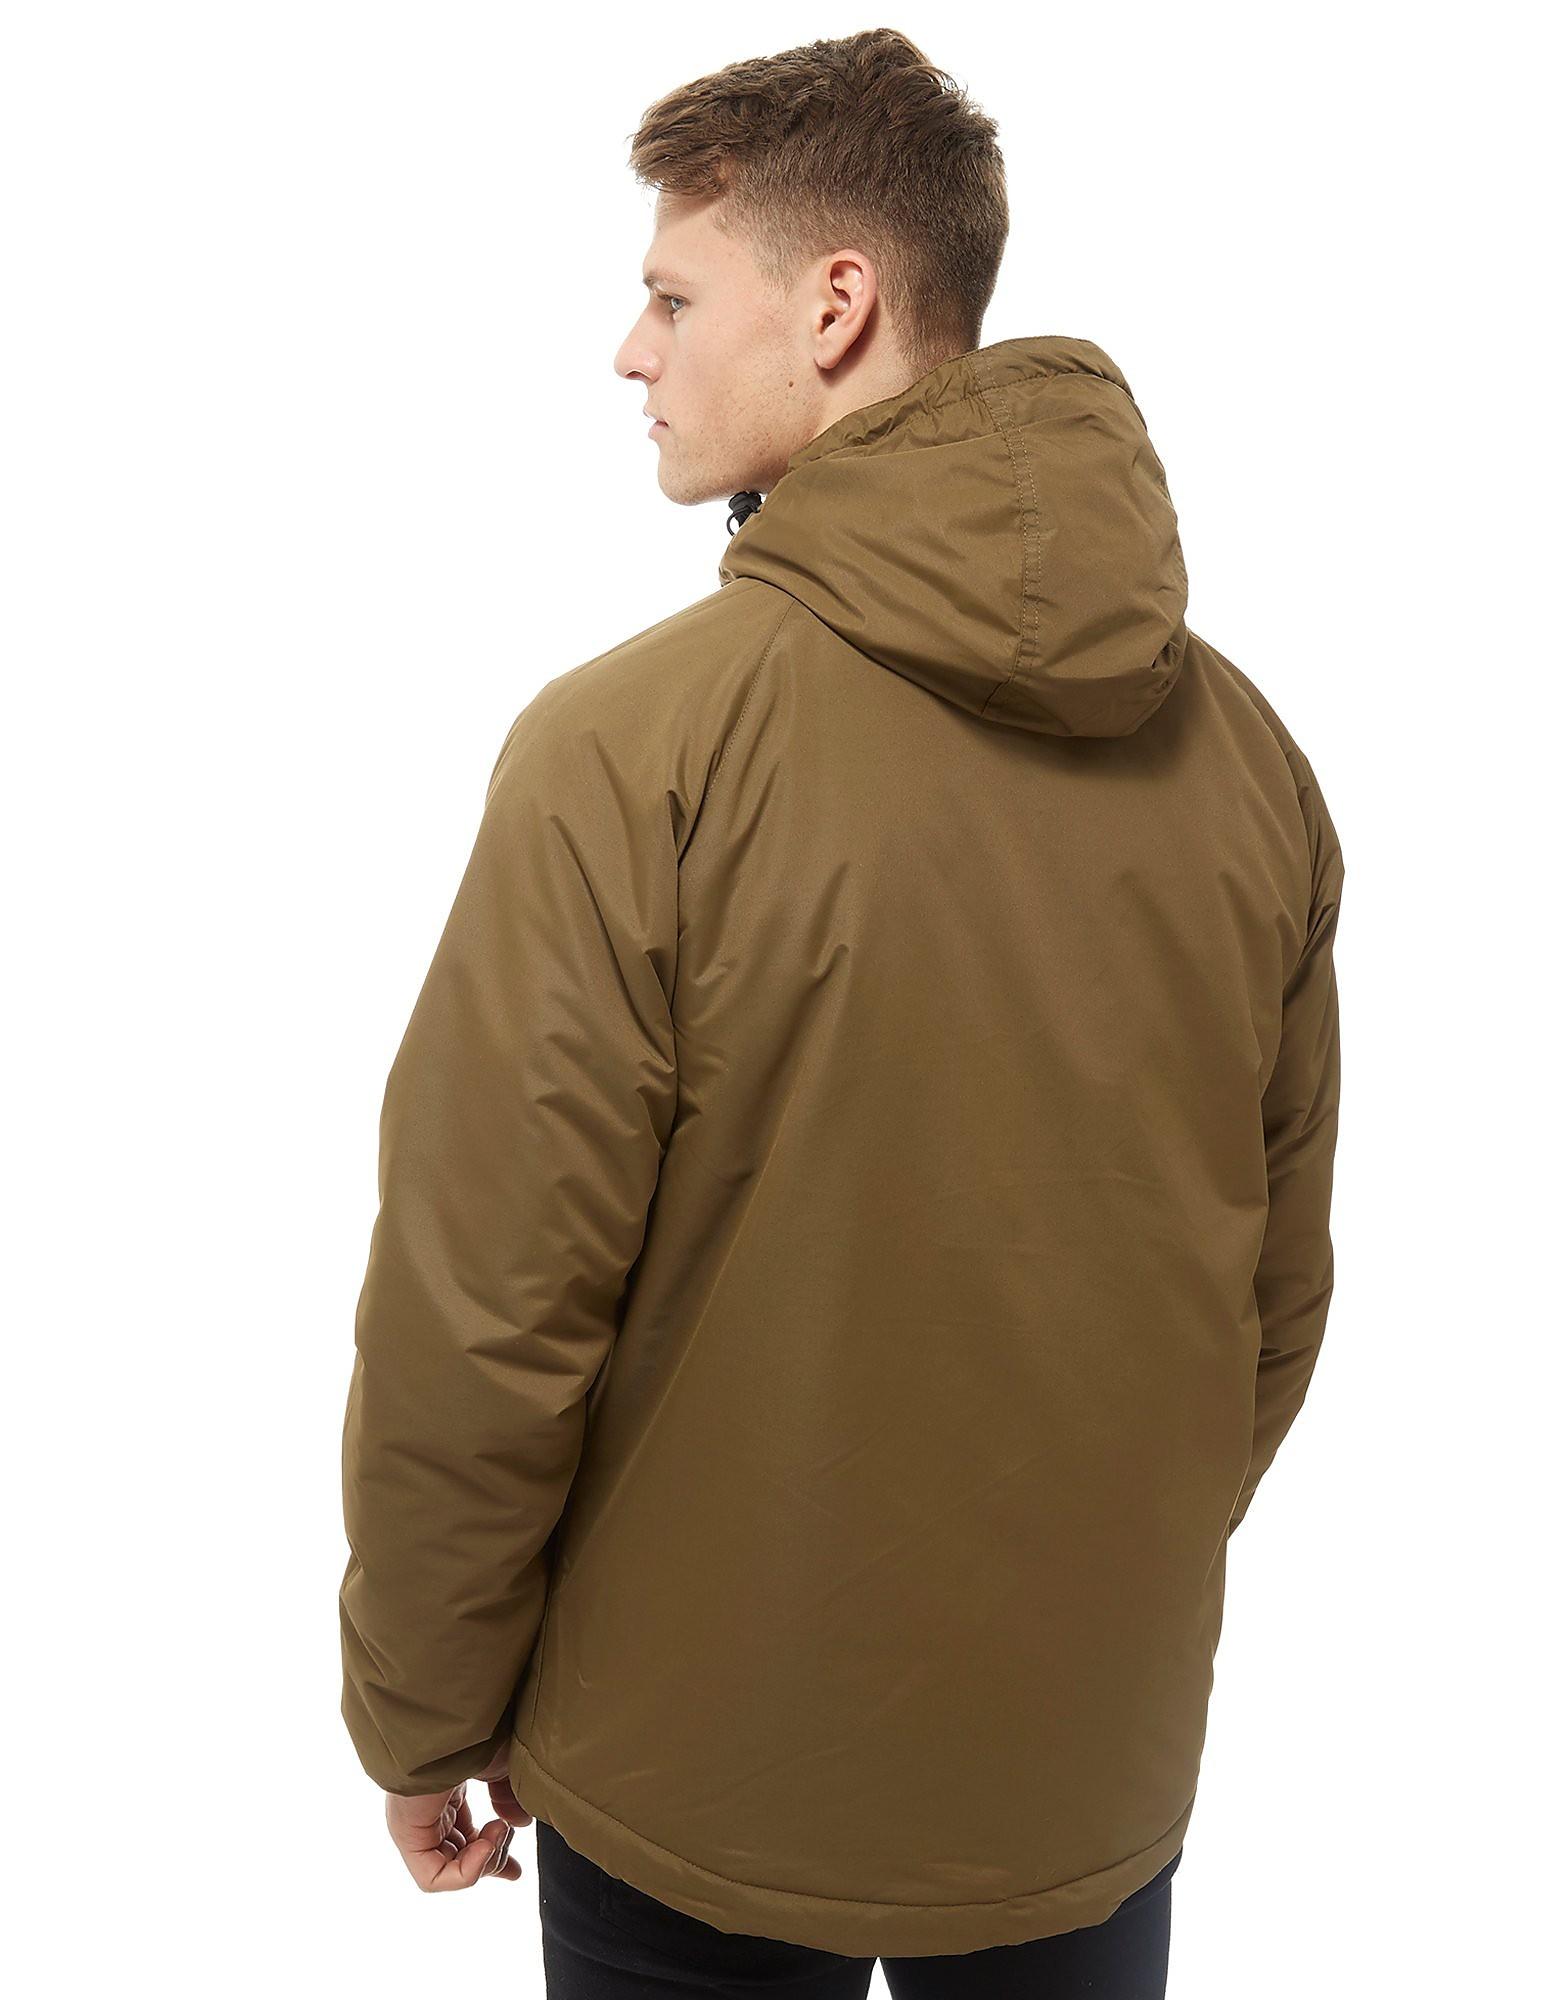 McKenzie Gauntlet Jacket